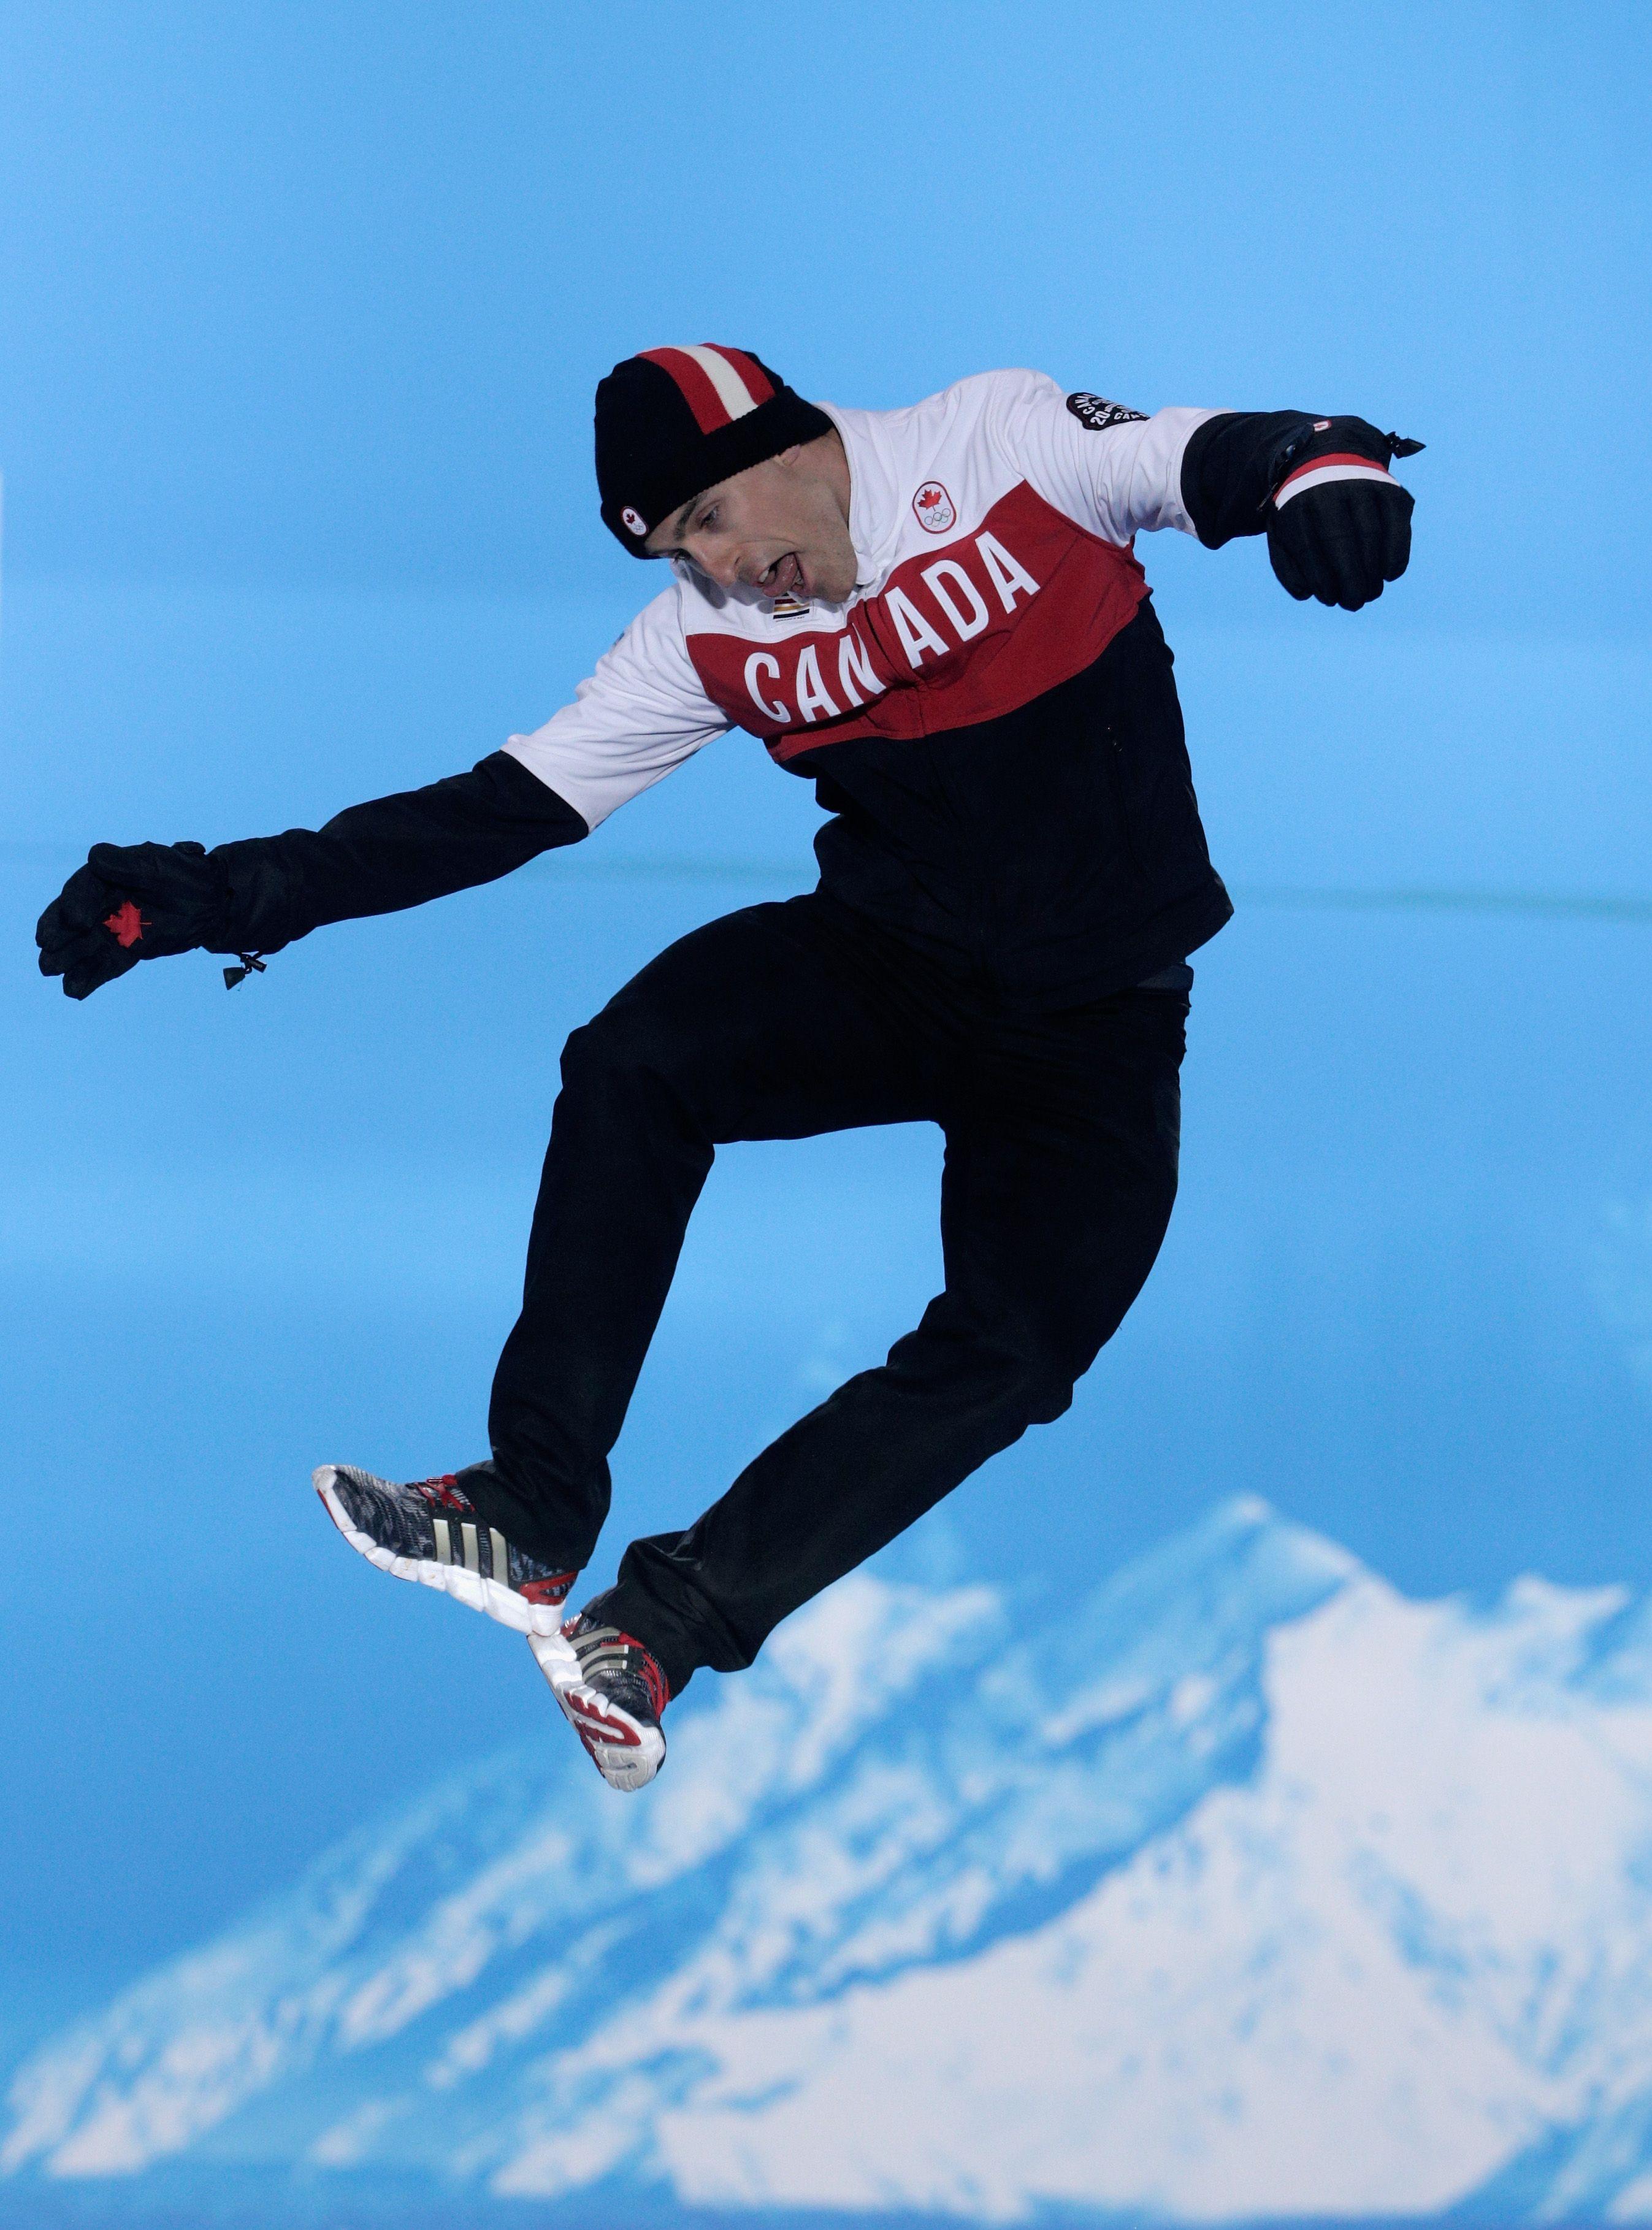 Bronze Medalist Denny Morrison Of Canada Celebrates On The